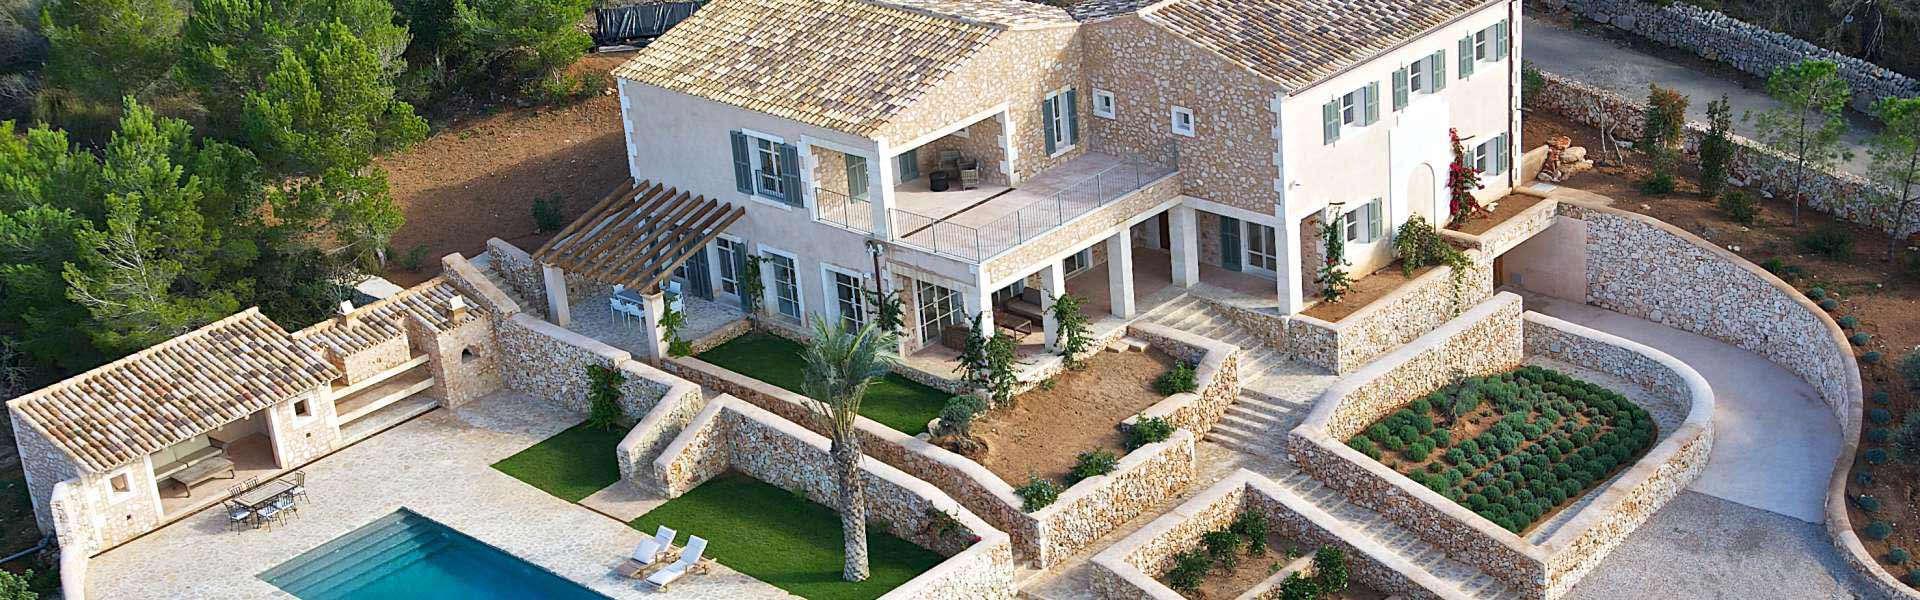 Montemar Immobilien Mallorca - Traumvilla mit Pool auf Mallorca